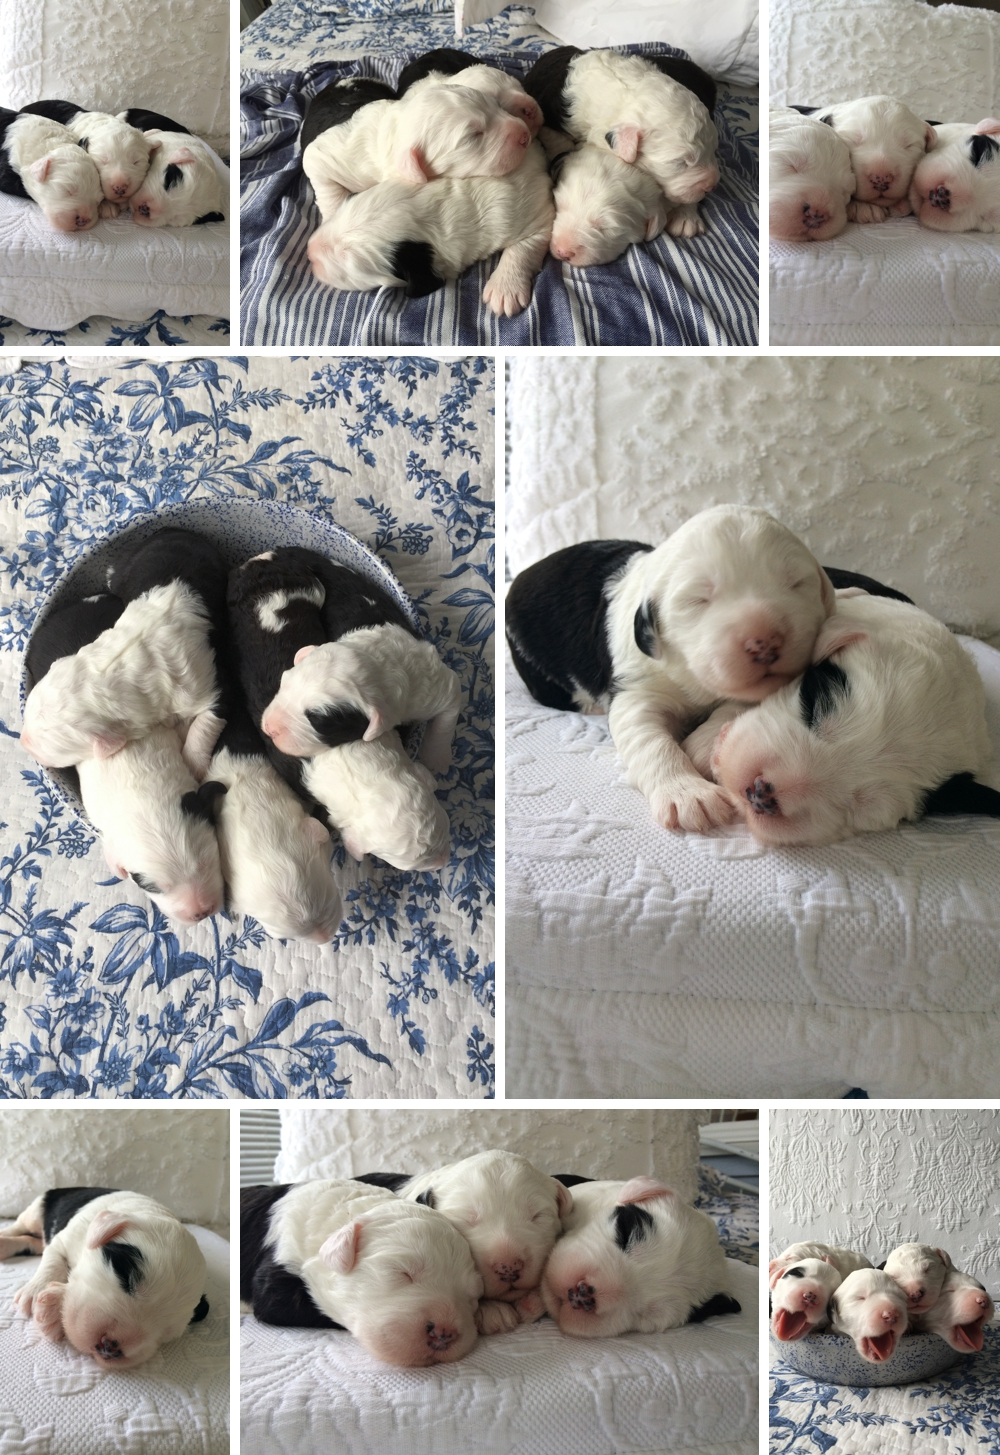 old english sheepdog puppies, SnowDowne OES, oes puppies, portland oregon breeders